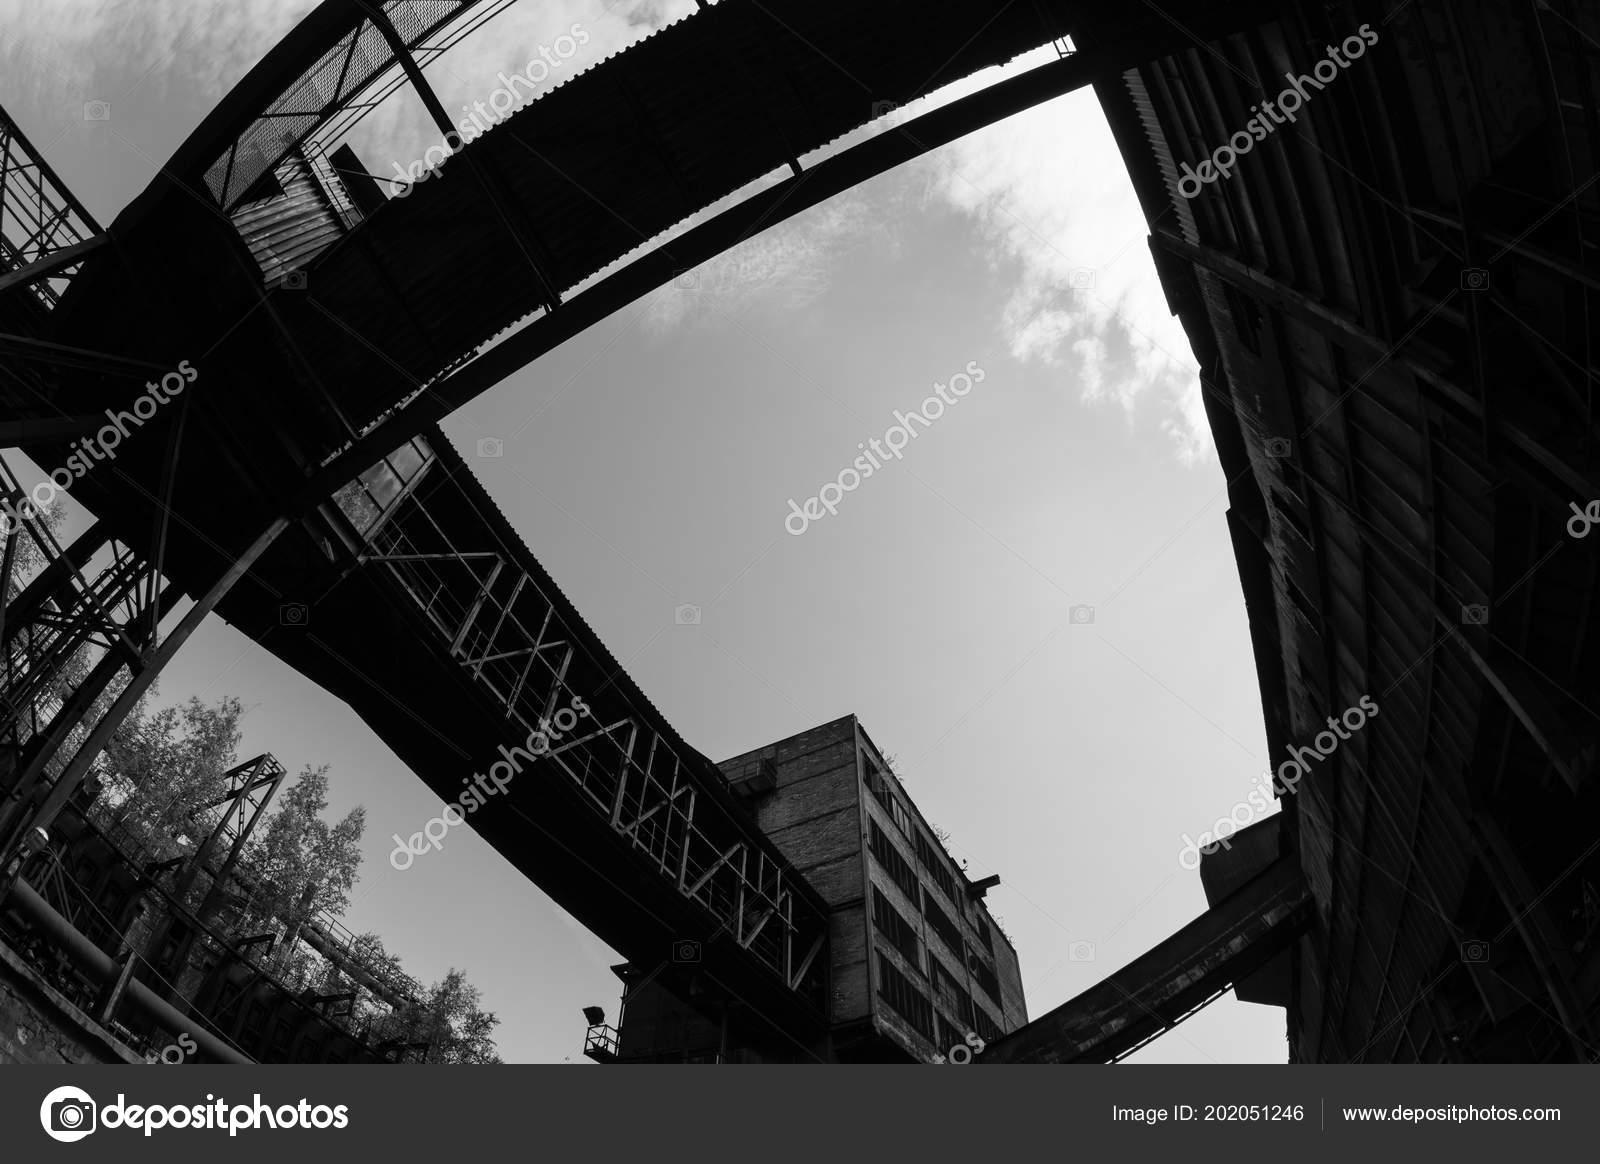 Abandoned Buildings Dolni Vitkovice Industrial Area Ostrava Czech Republic Stock Photo C Vidumg 202051246